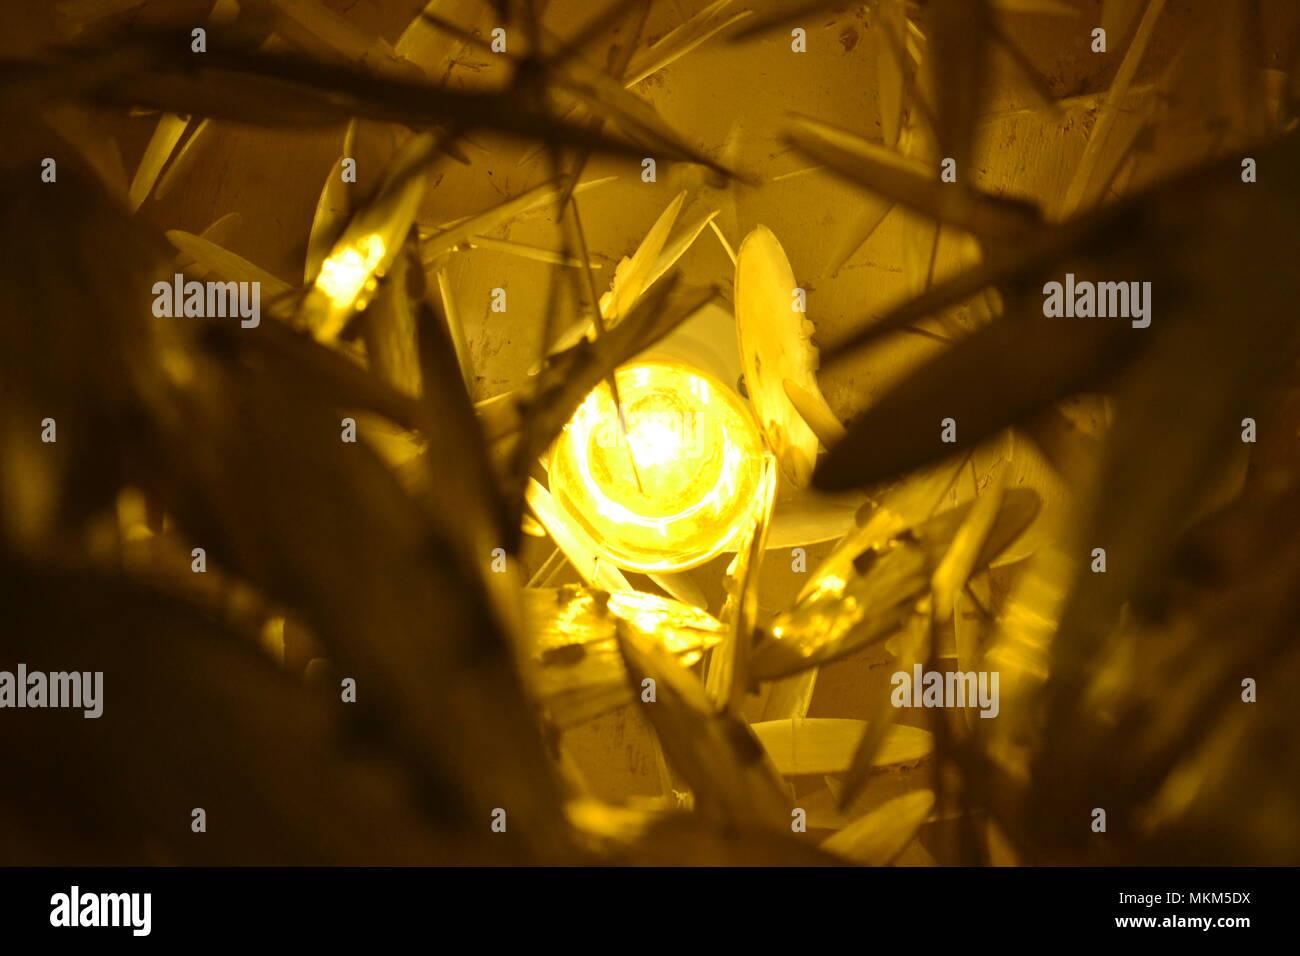 Light inside a chandelier. - Stock Image